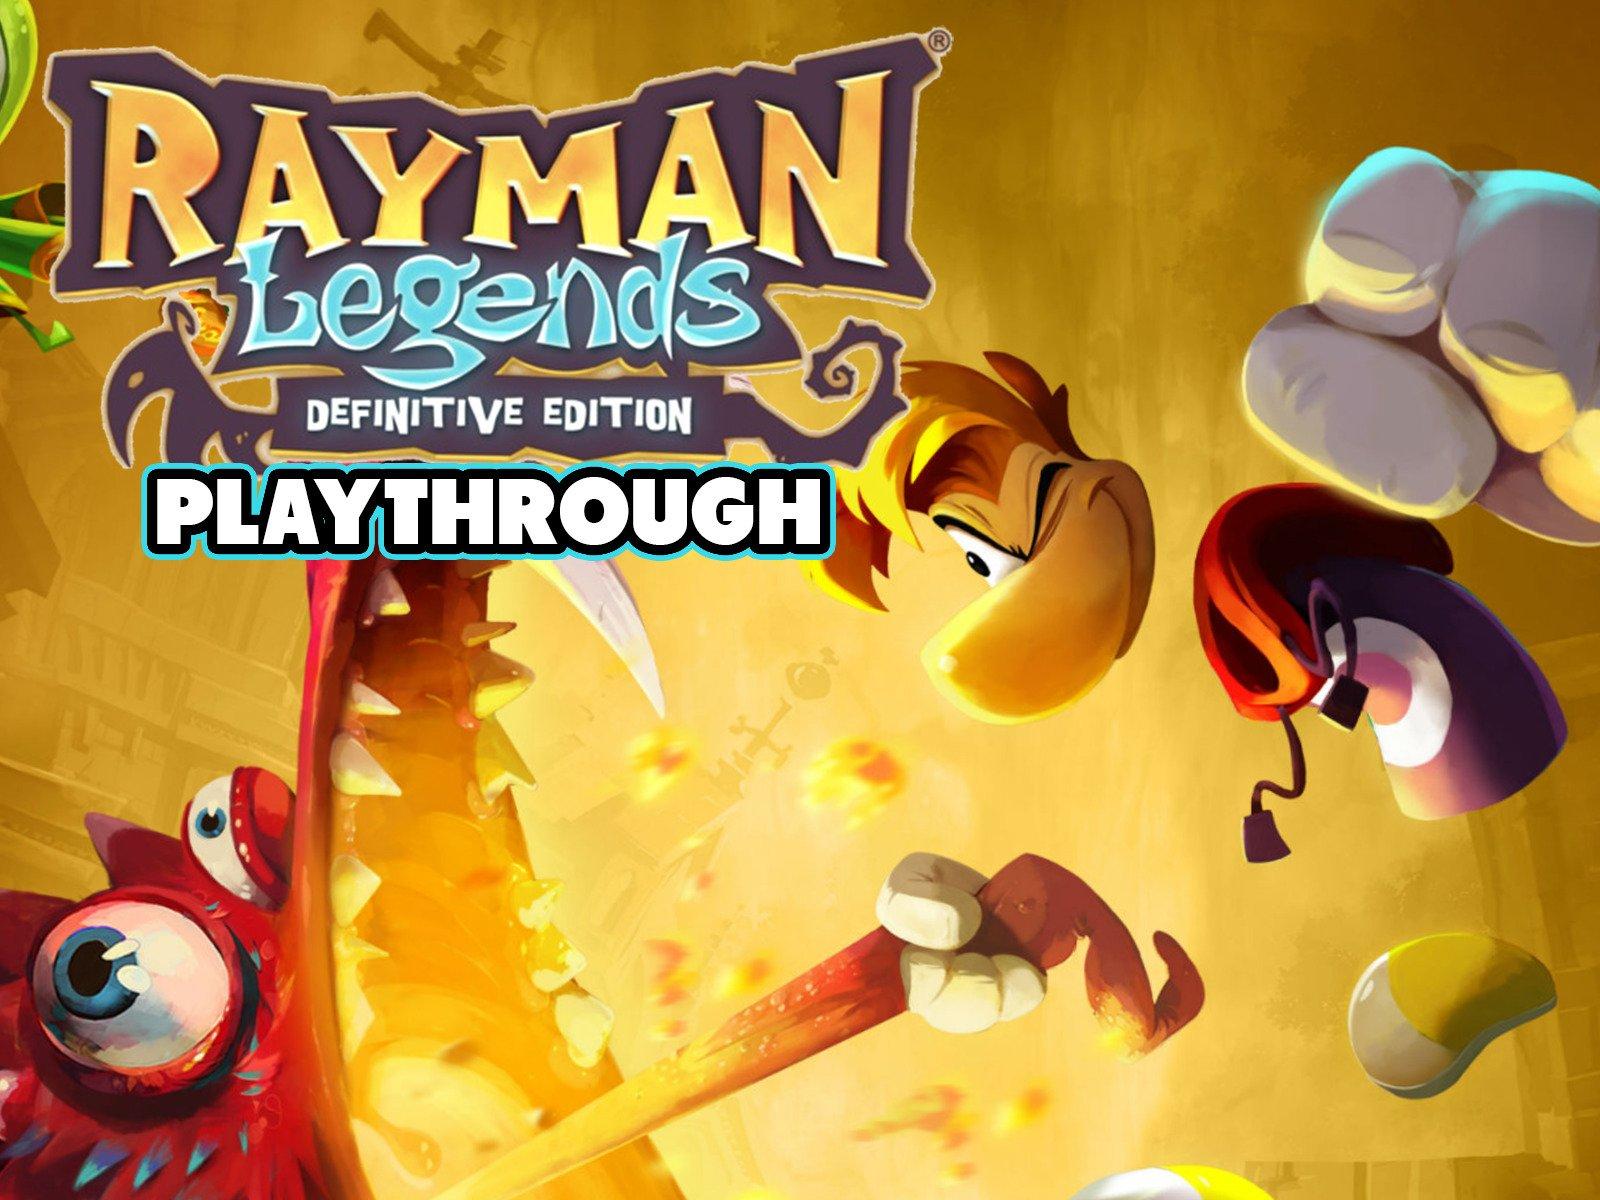 Clip: Rayman Legends Definitive Edition Playthrough - Season 1